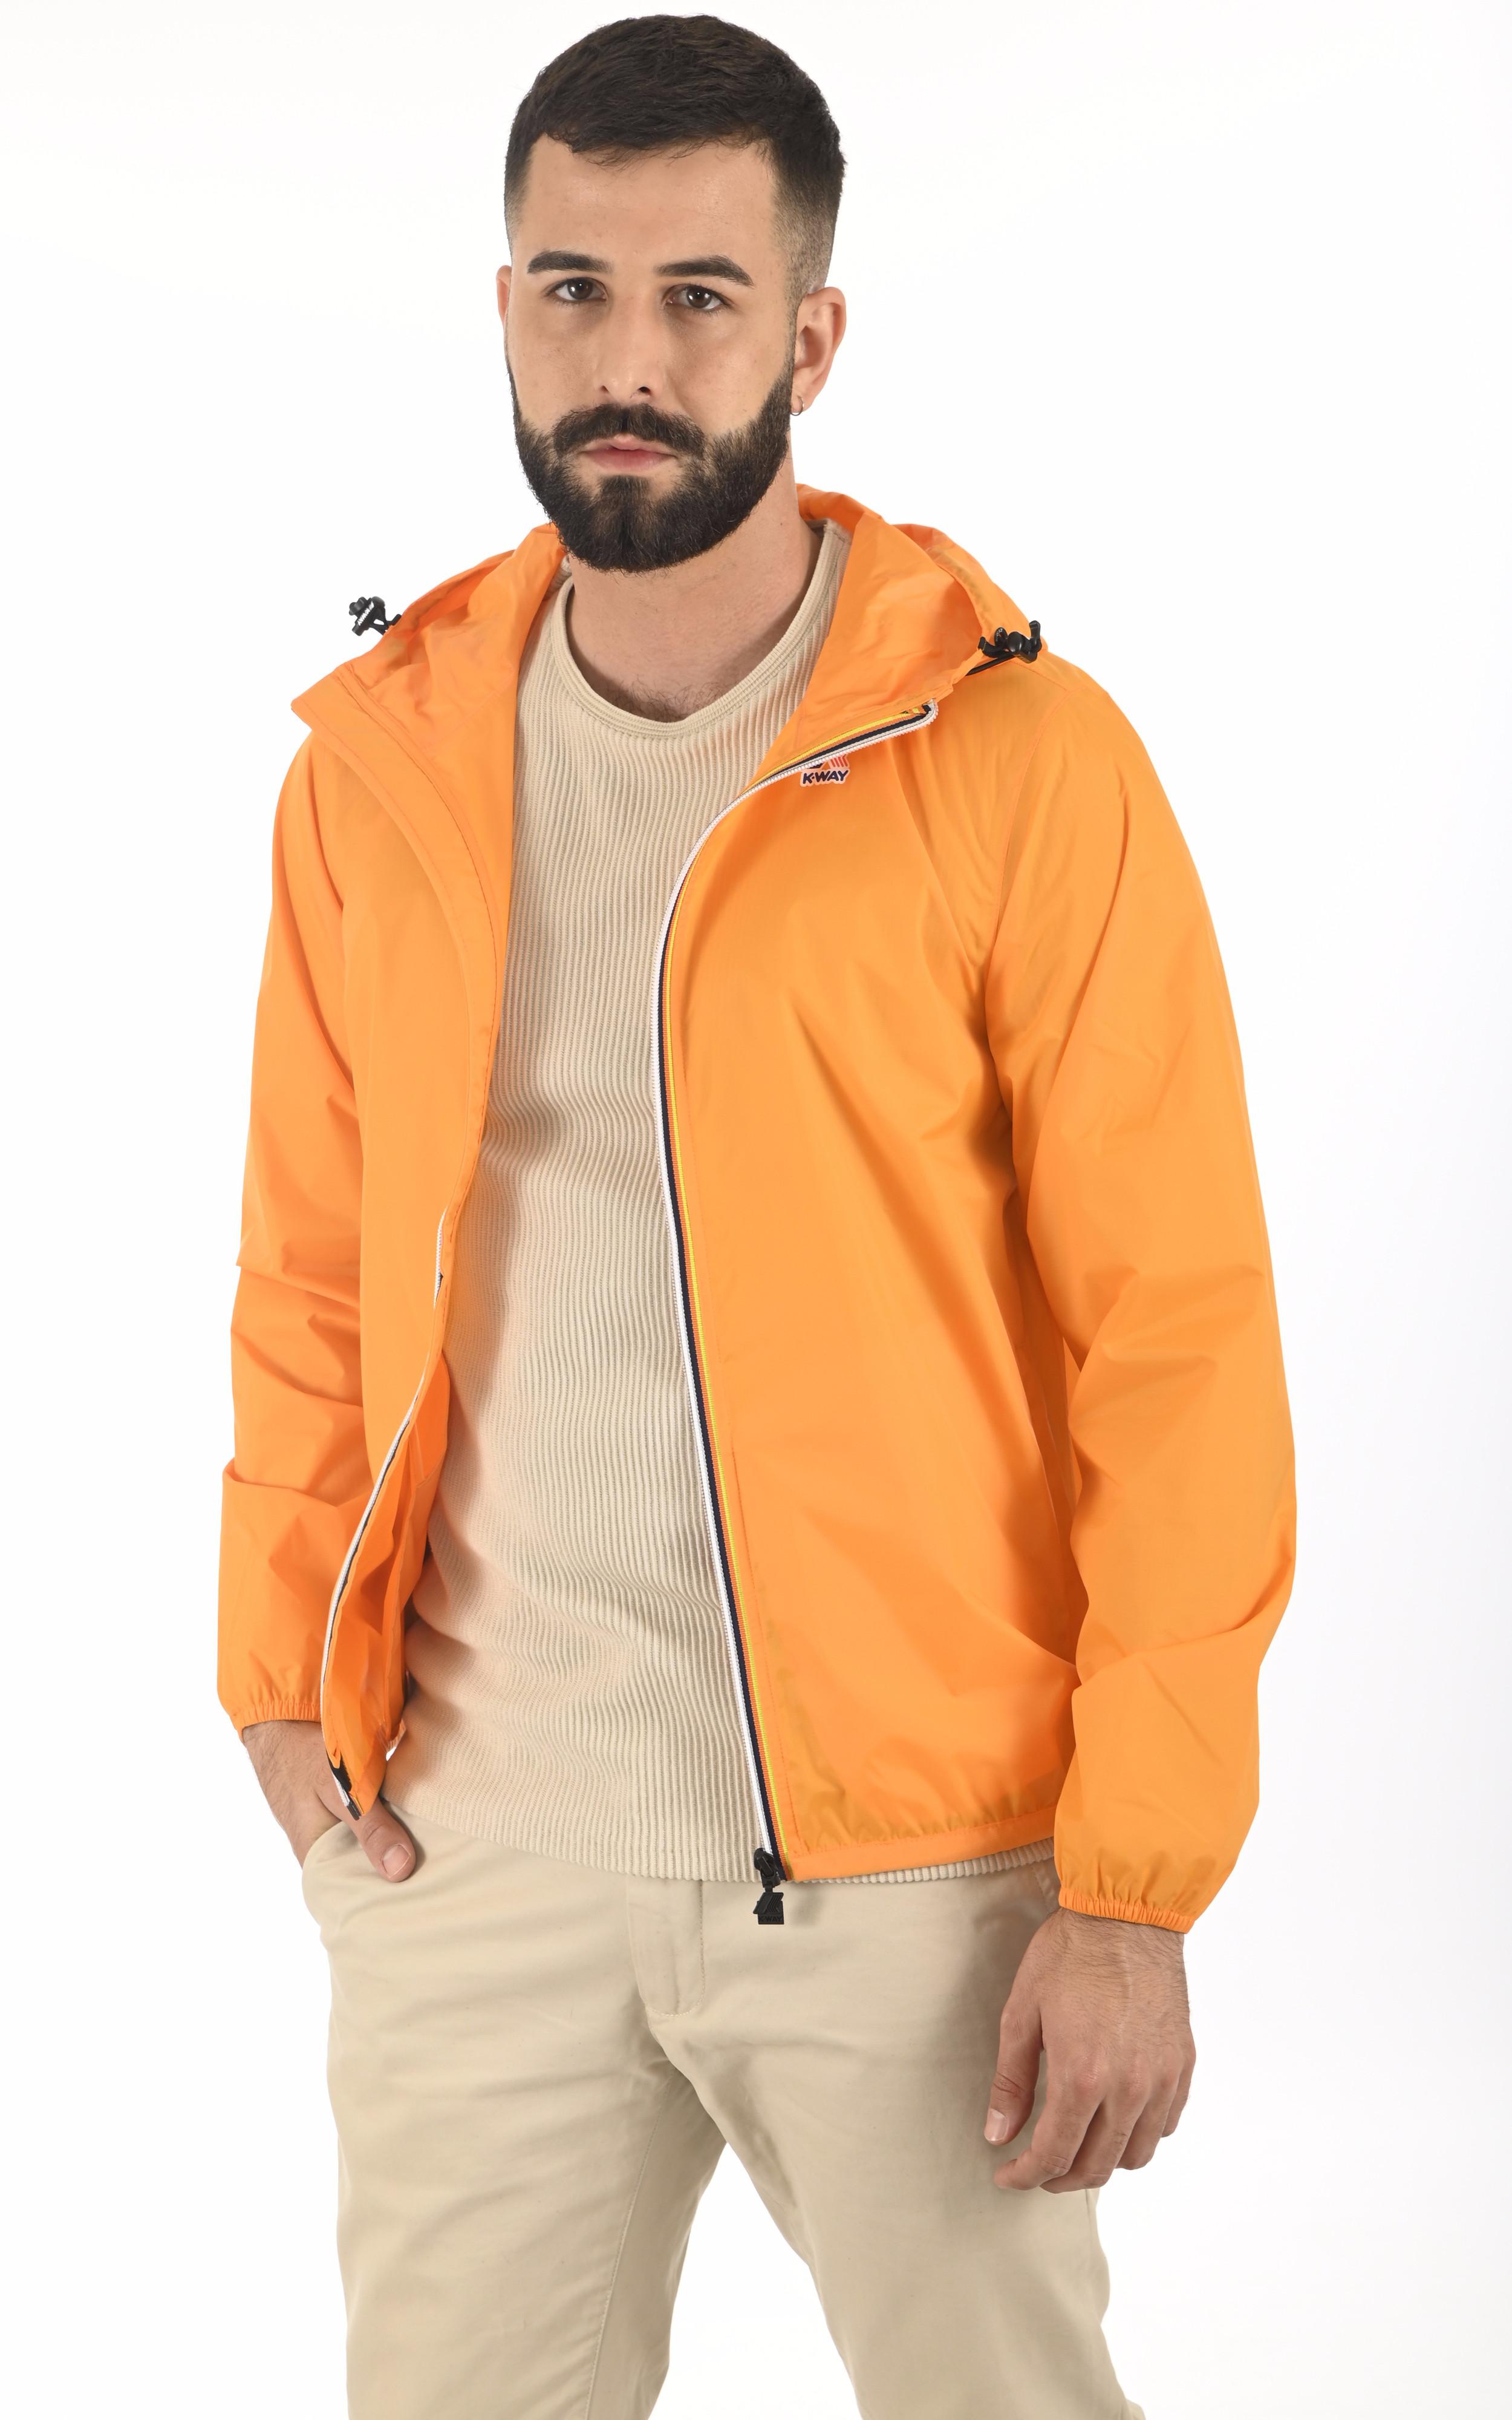 Le Vrai Claude 3.0 orange K-Way